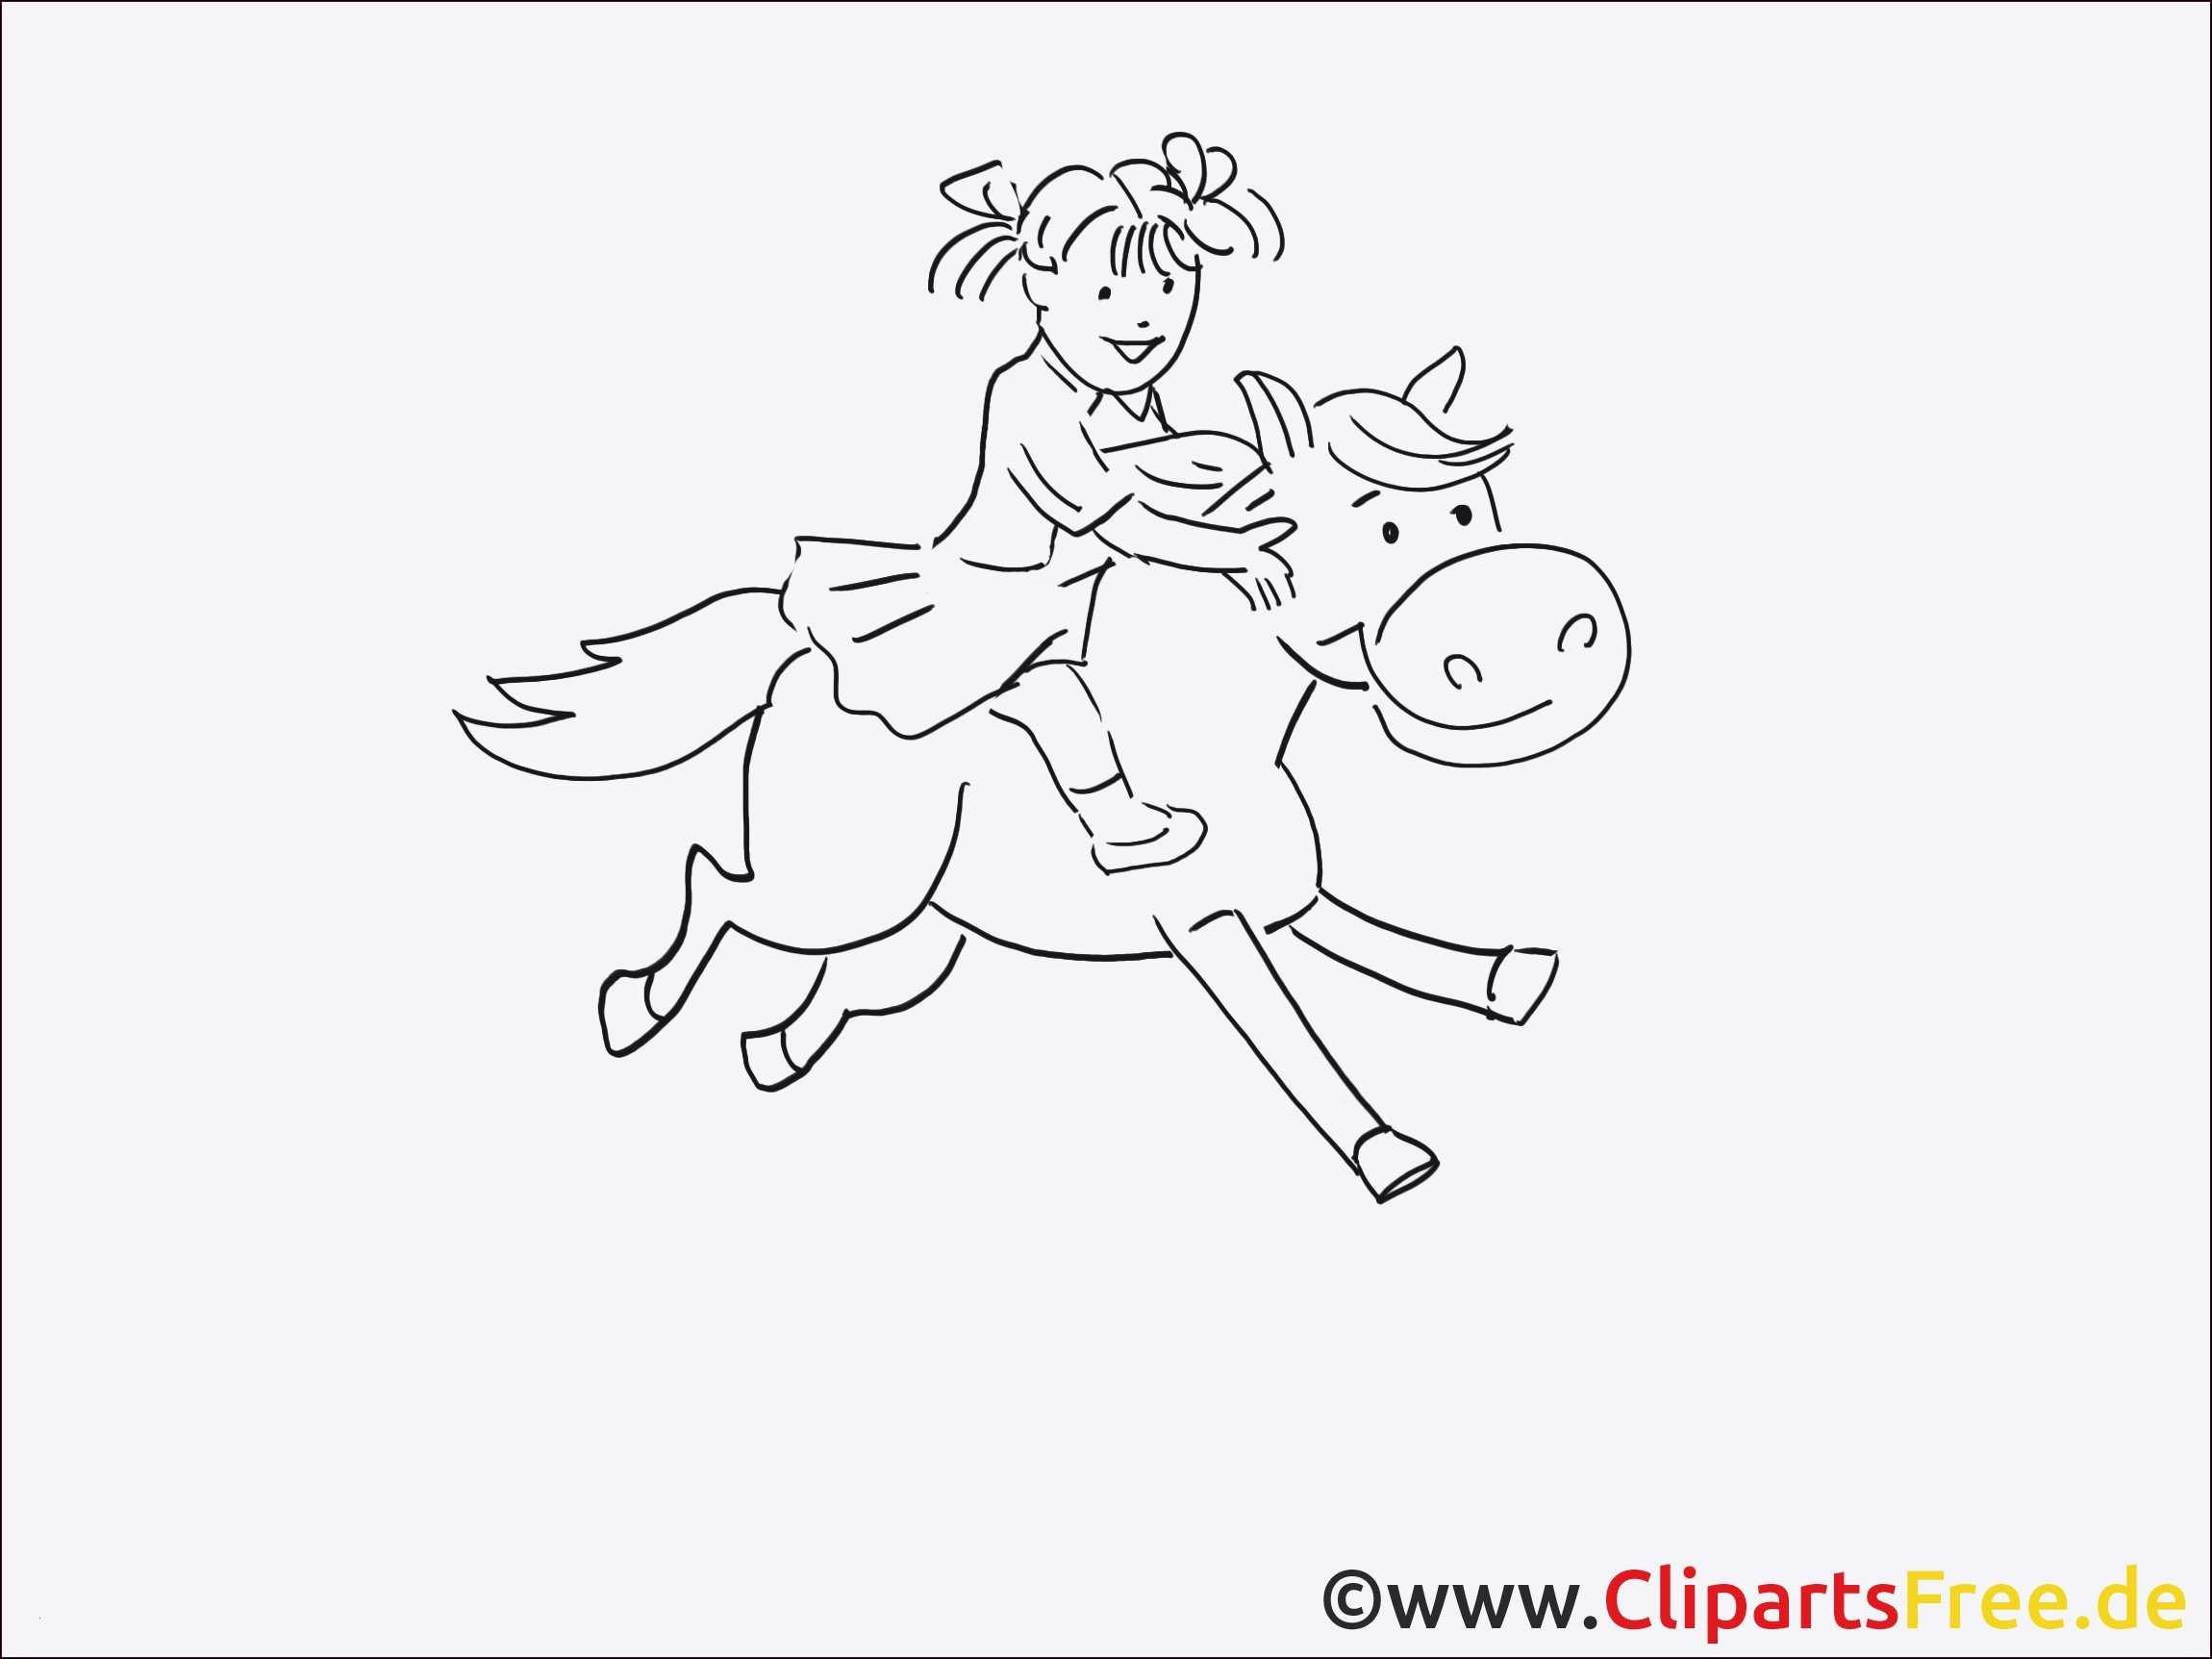 Ninjago Zane Ausmalbilder Genial Ausmalbilder Ninjago Lloyd Bildnis Ausmalbilder Pferde Mit Madchen Bilder